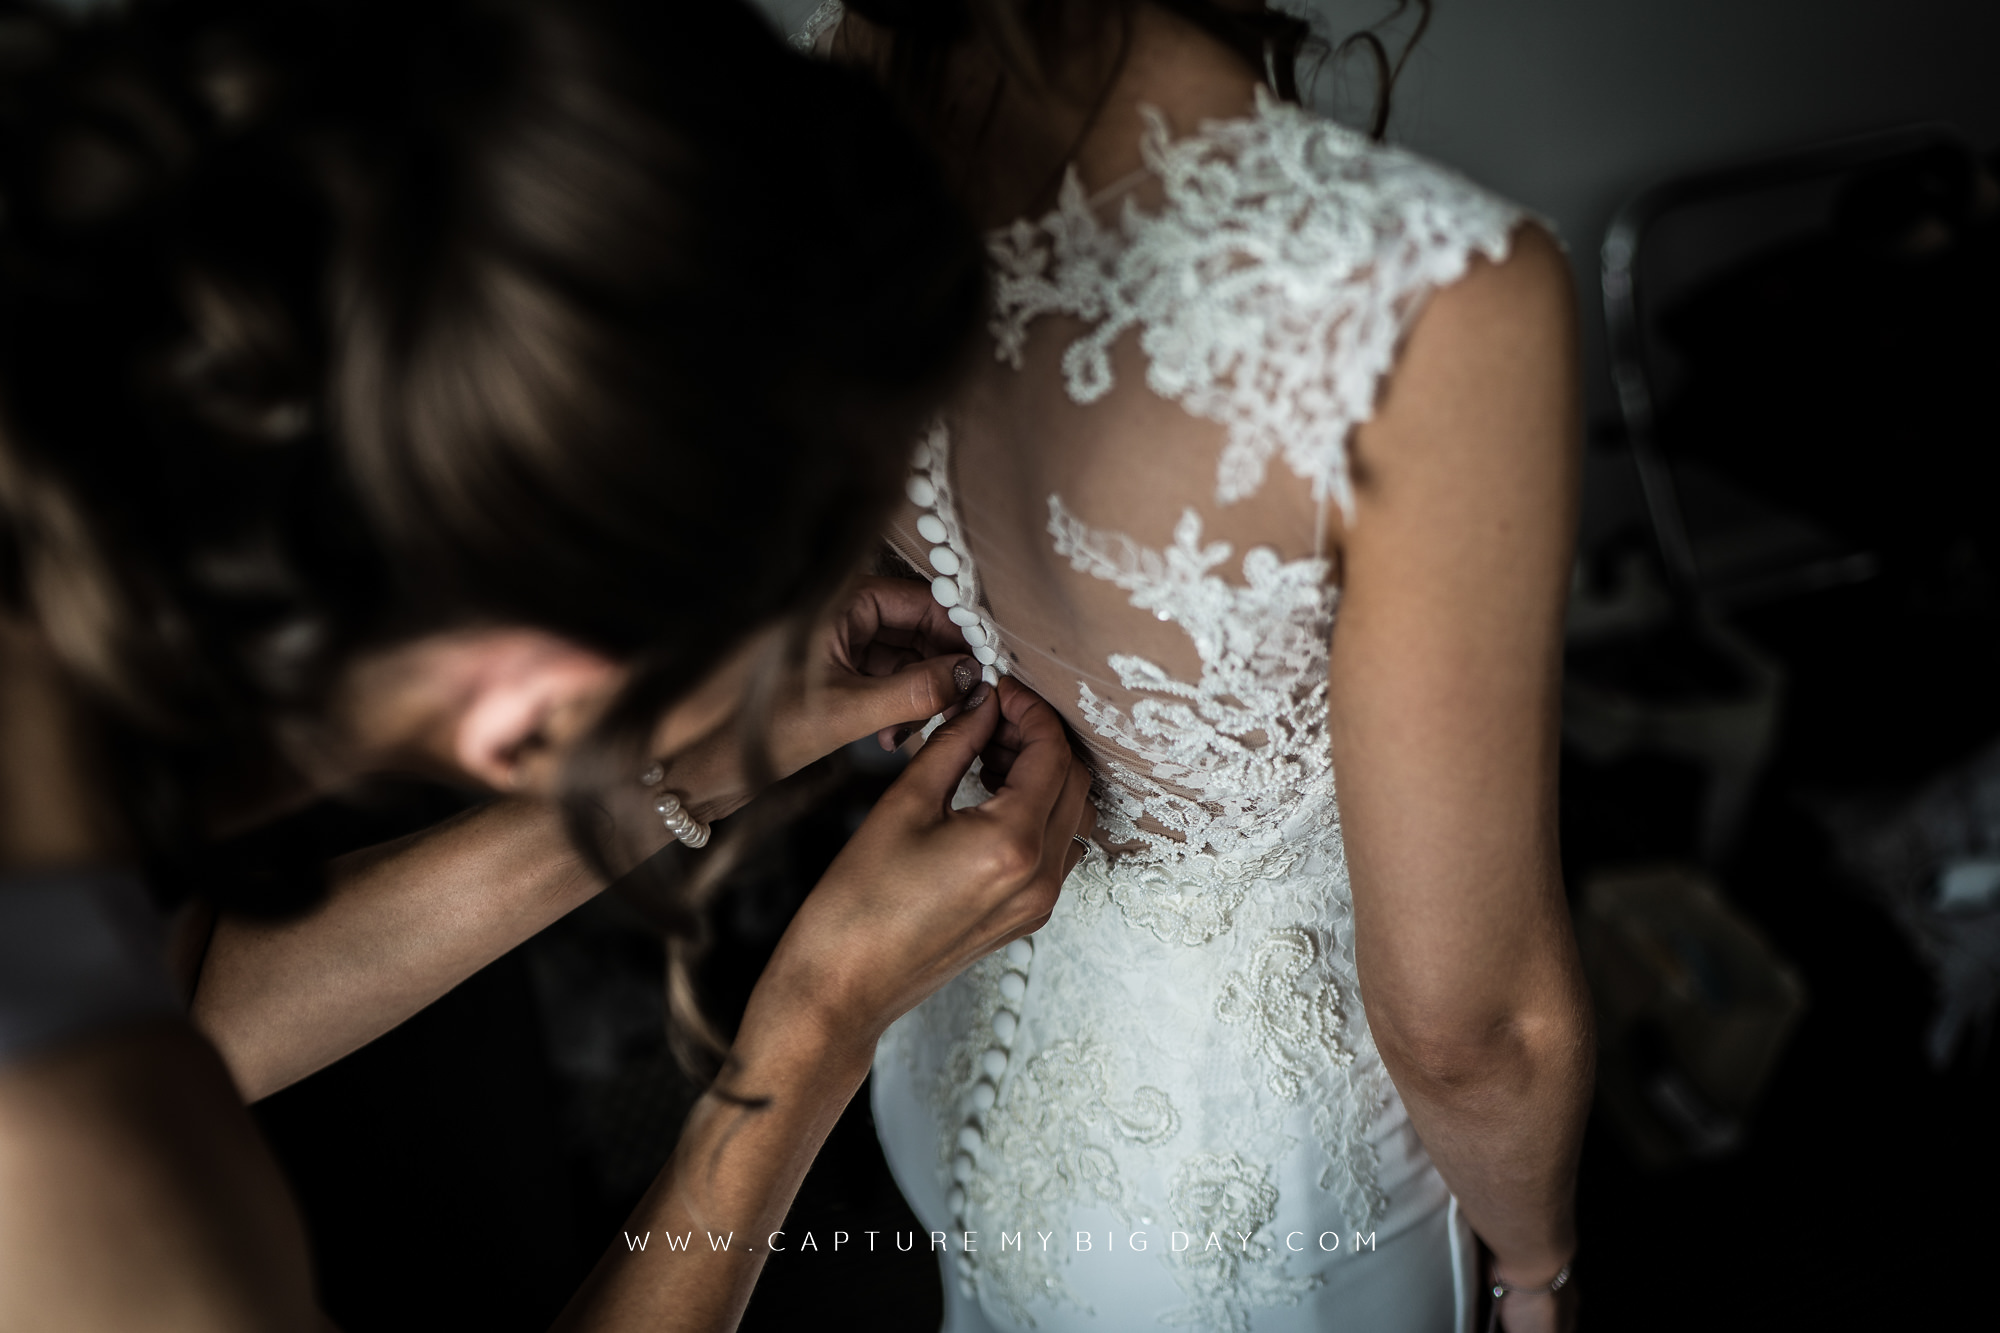 wedding dress being buttoned up